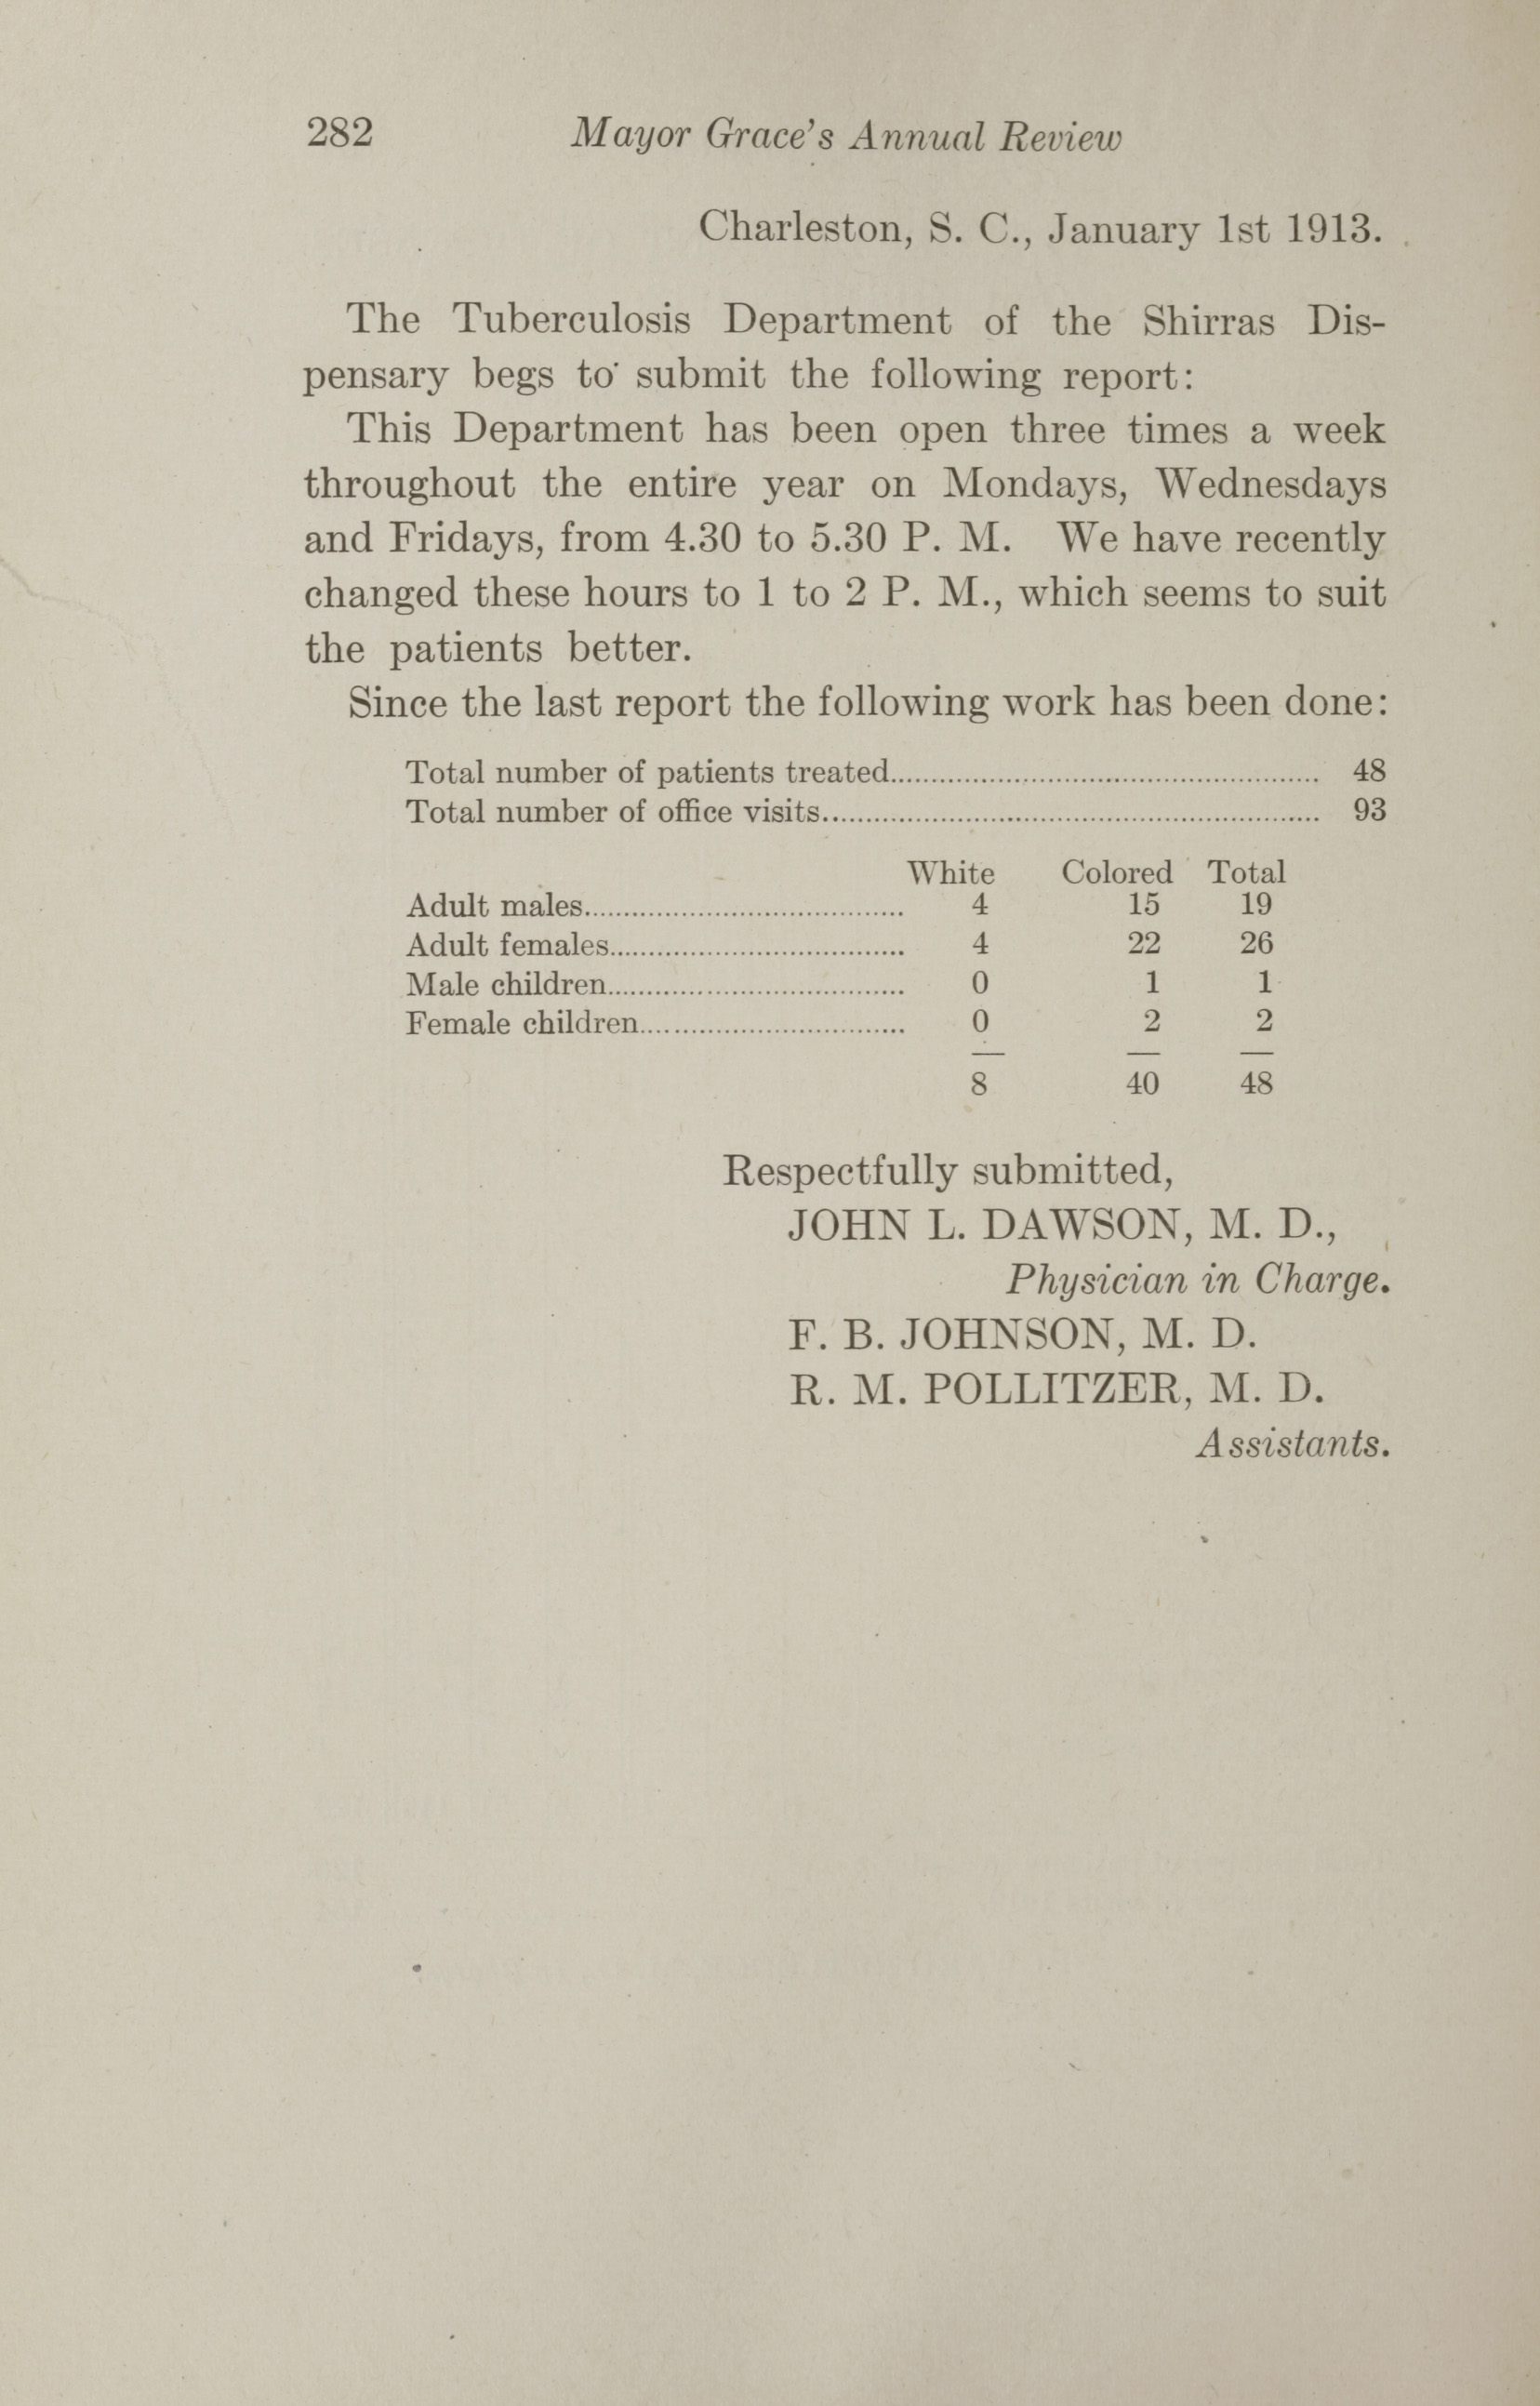 Charleston Yearbook, 1912, page 282